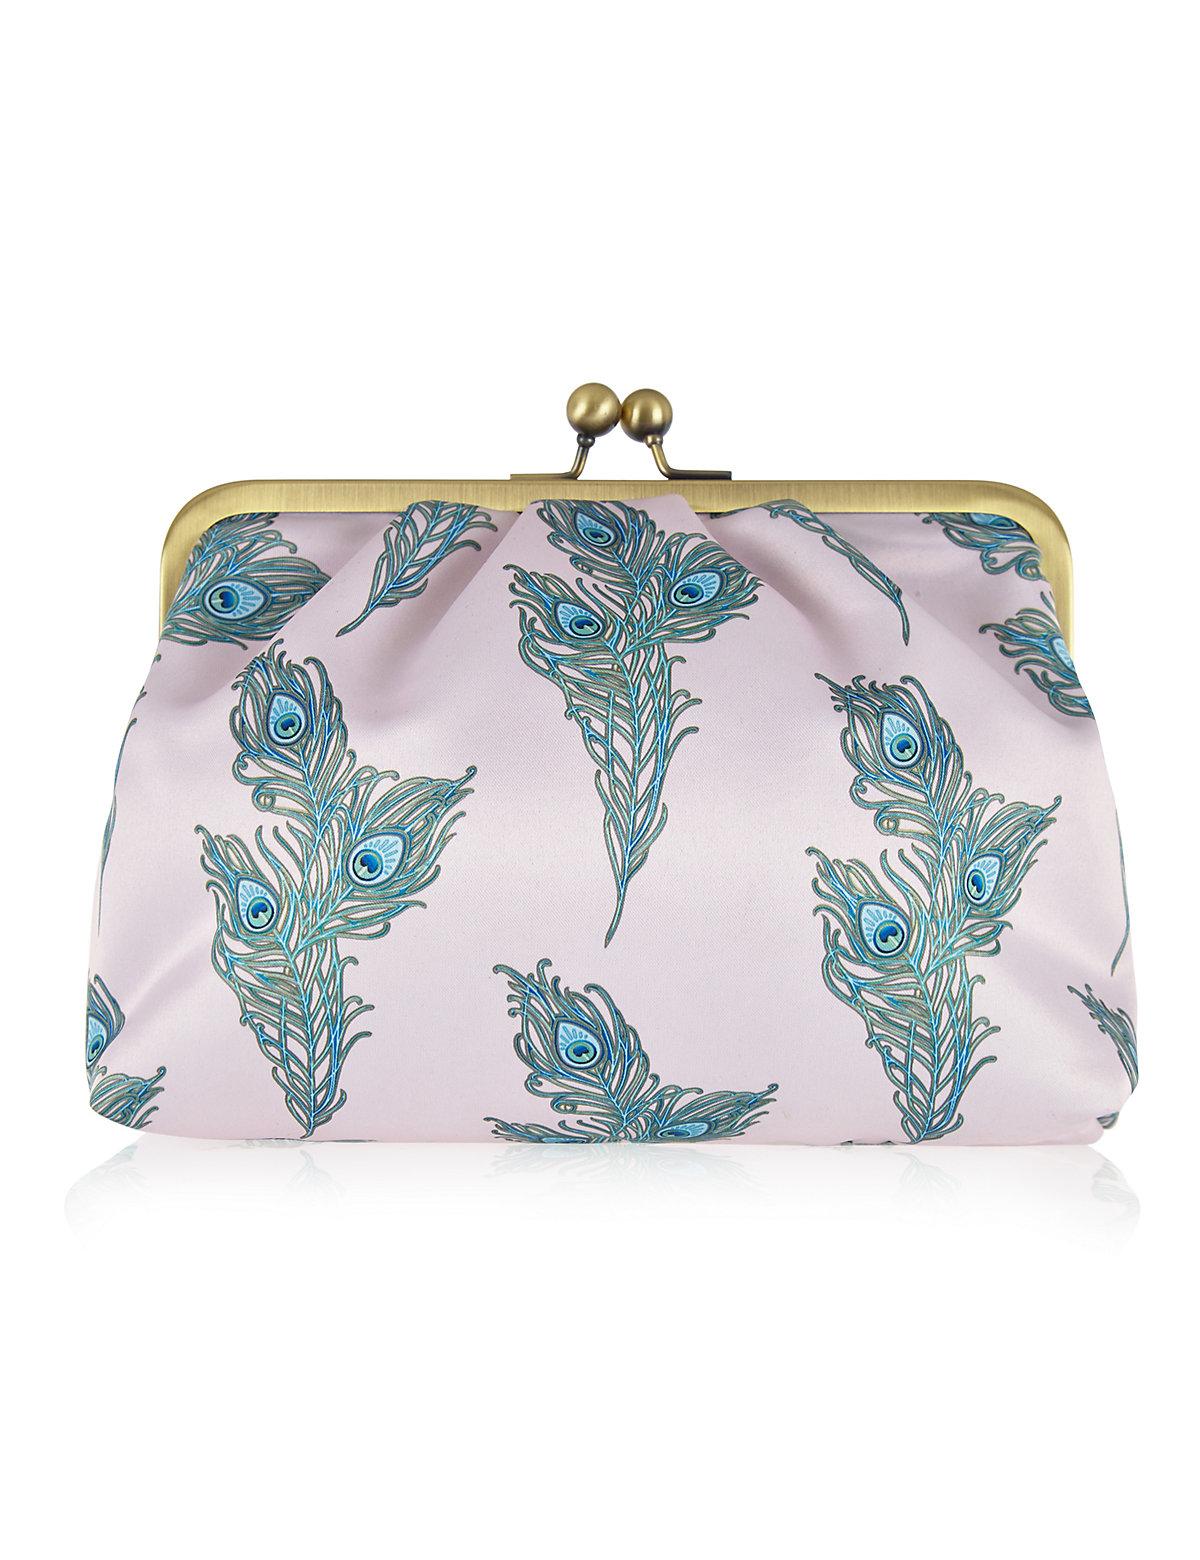 Downton Abbey Cosmetic Bag $12.50 AT vintagedancer.com